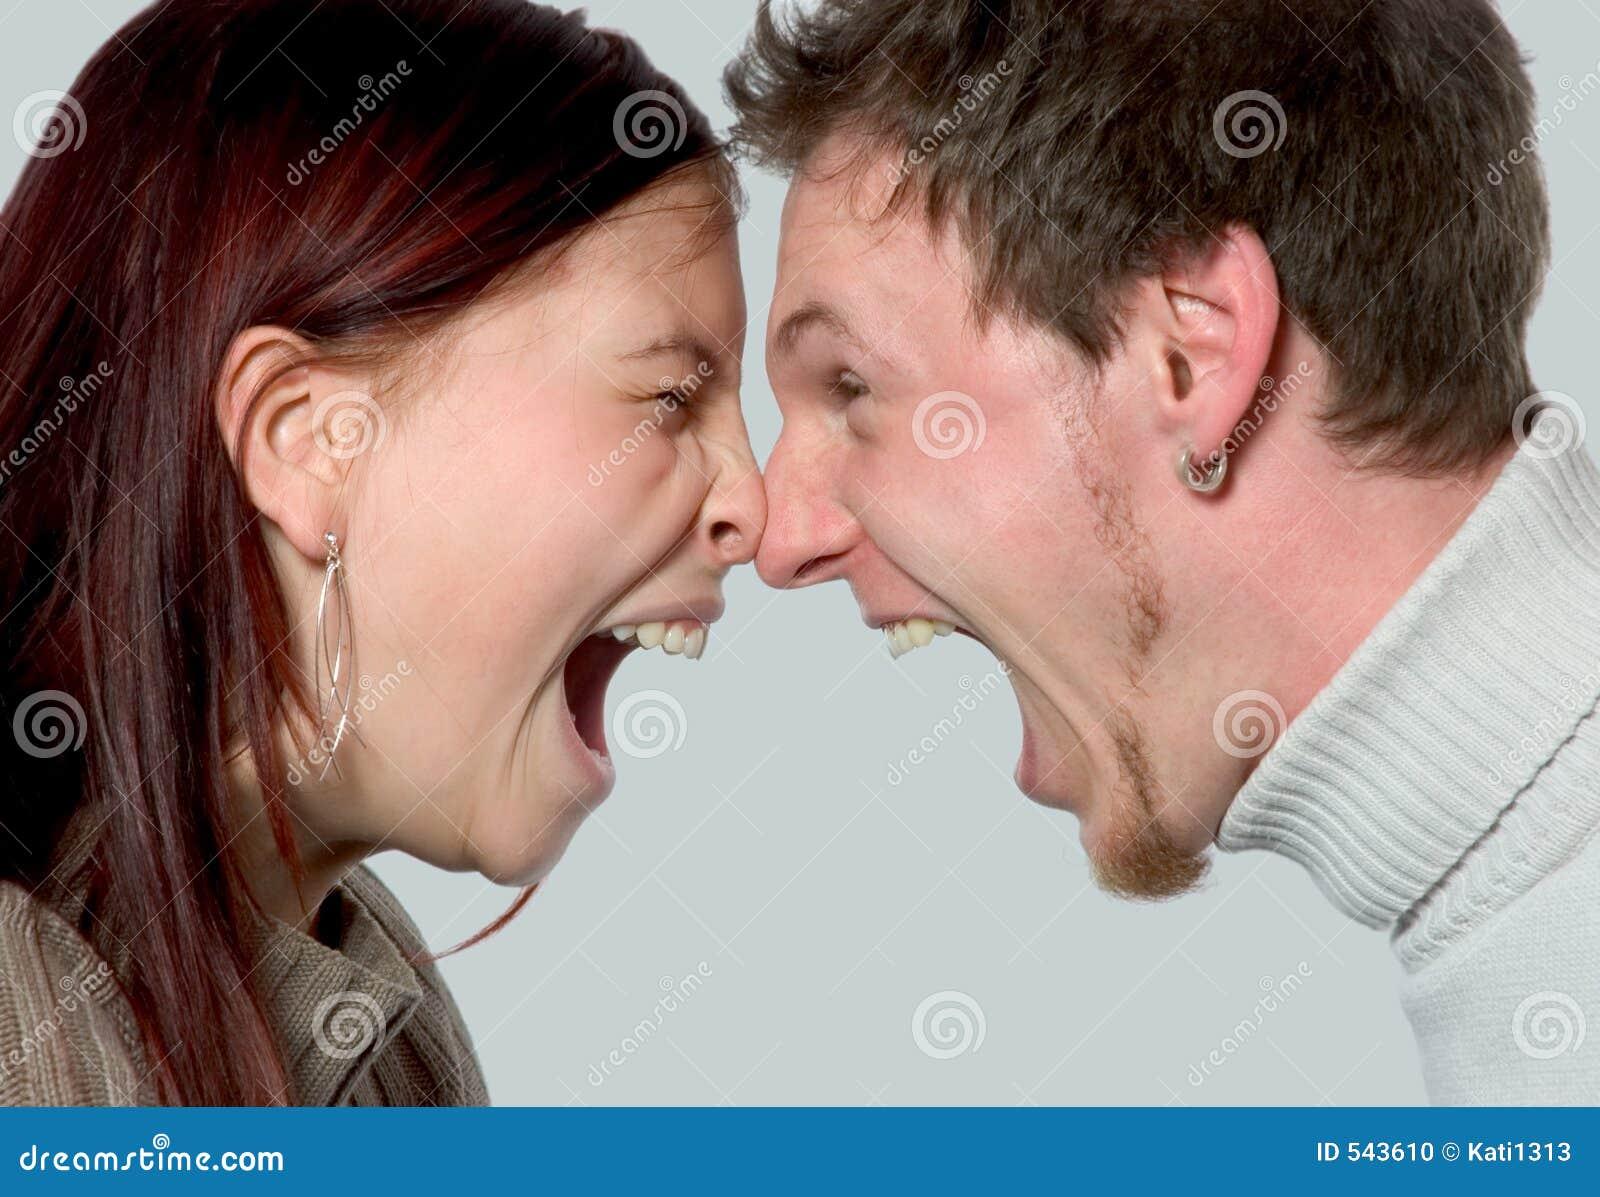 Download 尖叫 库存照片. 图片 包括有 大声, 疯狂, 表达式, 夫妇, 传神, 吓呆, 冲突, 噪声, 纵向, 动物 - 543610